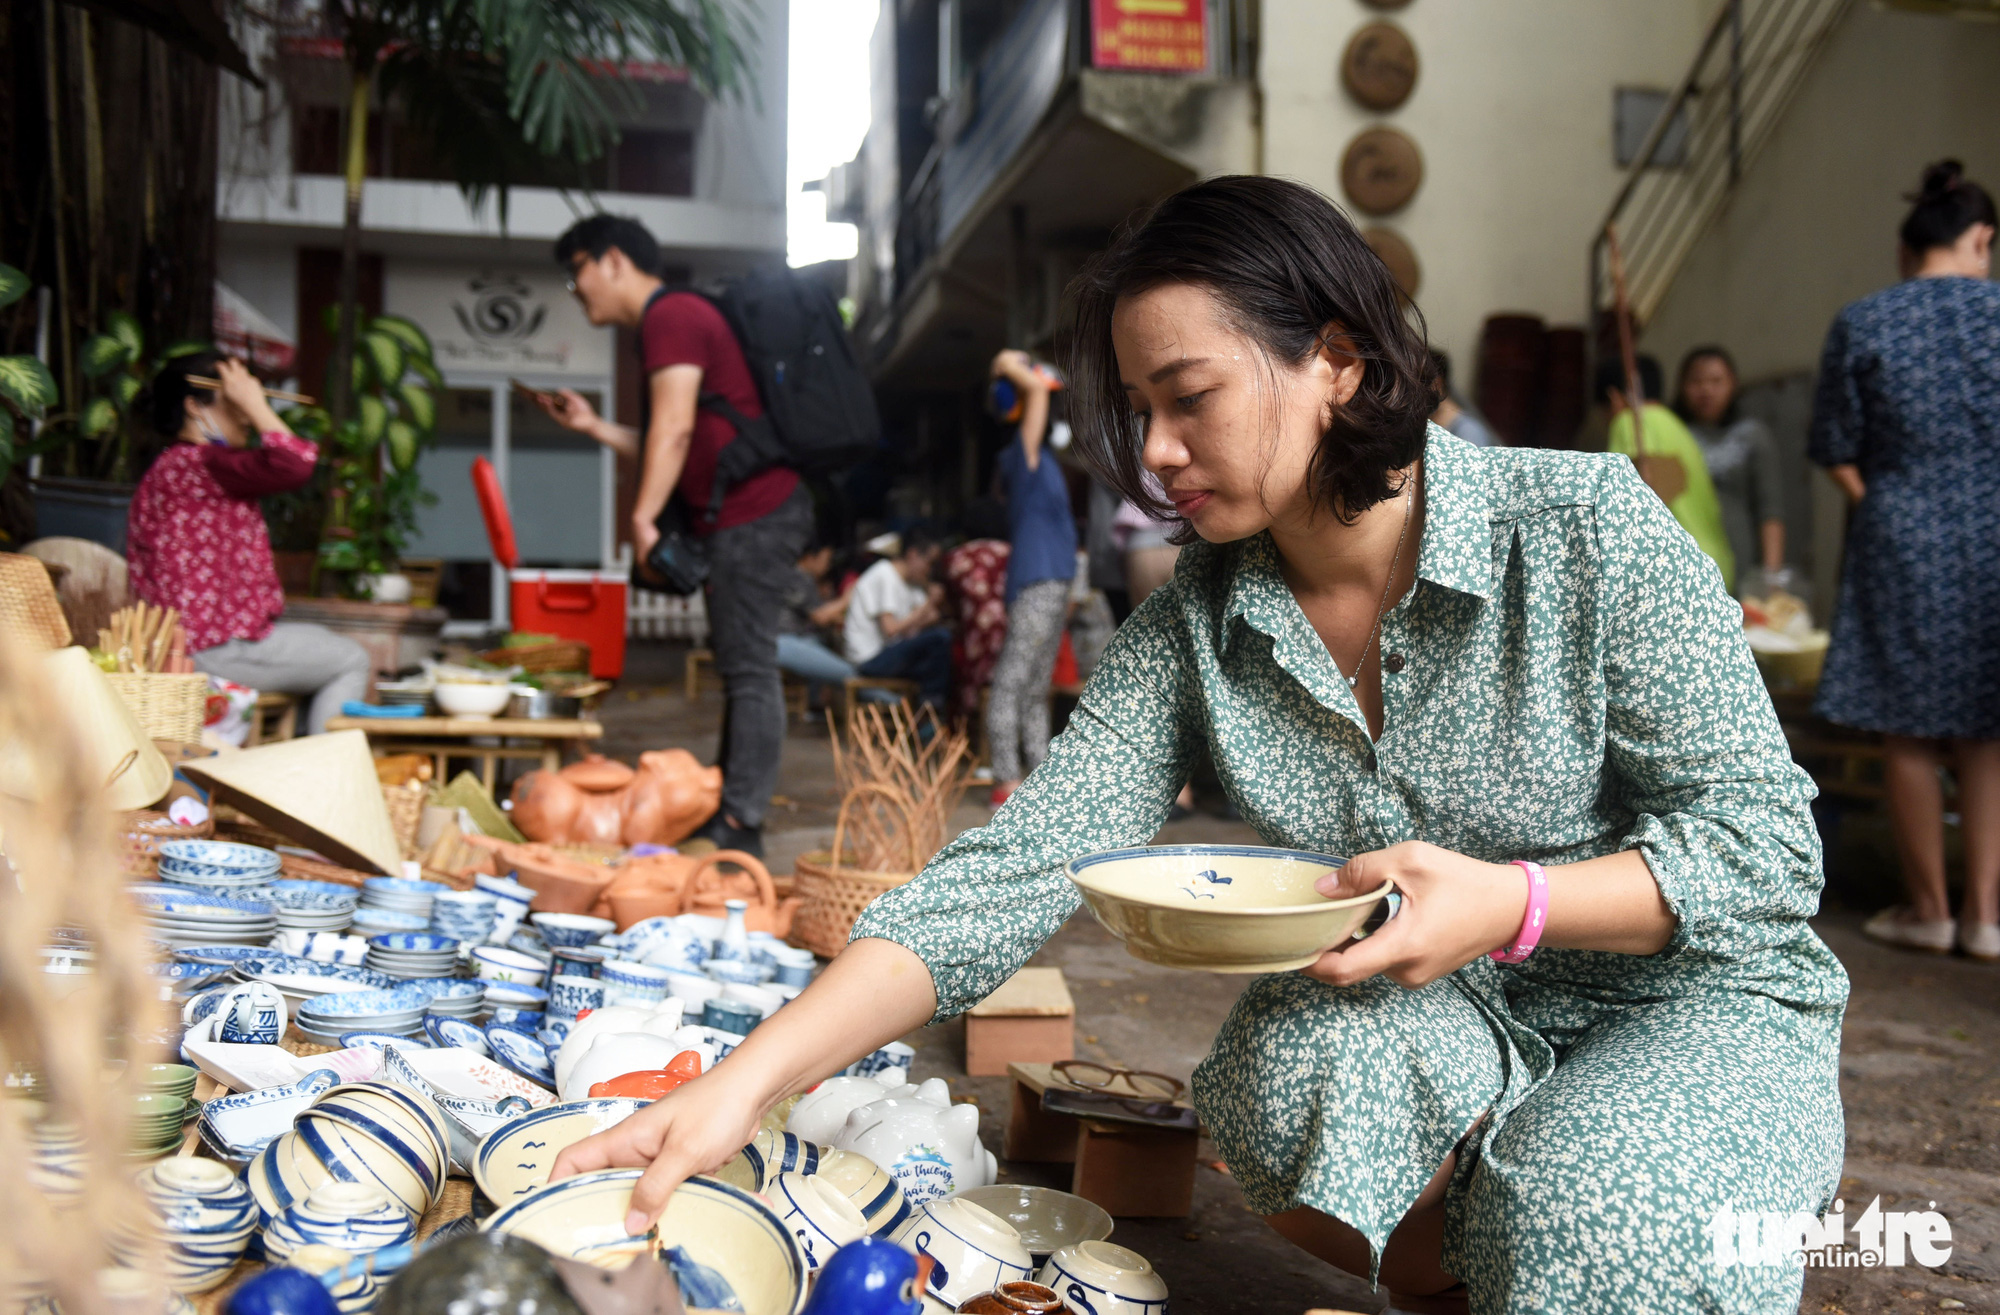 Truong Thi Ngoc Nhung selects pottery dinnerware at a 'countryside market' at No. 7 Nguyen Thi Minh Khai Street, District 1, Ho Chi Minh City, Vietnam, May 24, 2020. Photo: Duyen Phan / Tuoi Tre